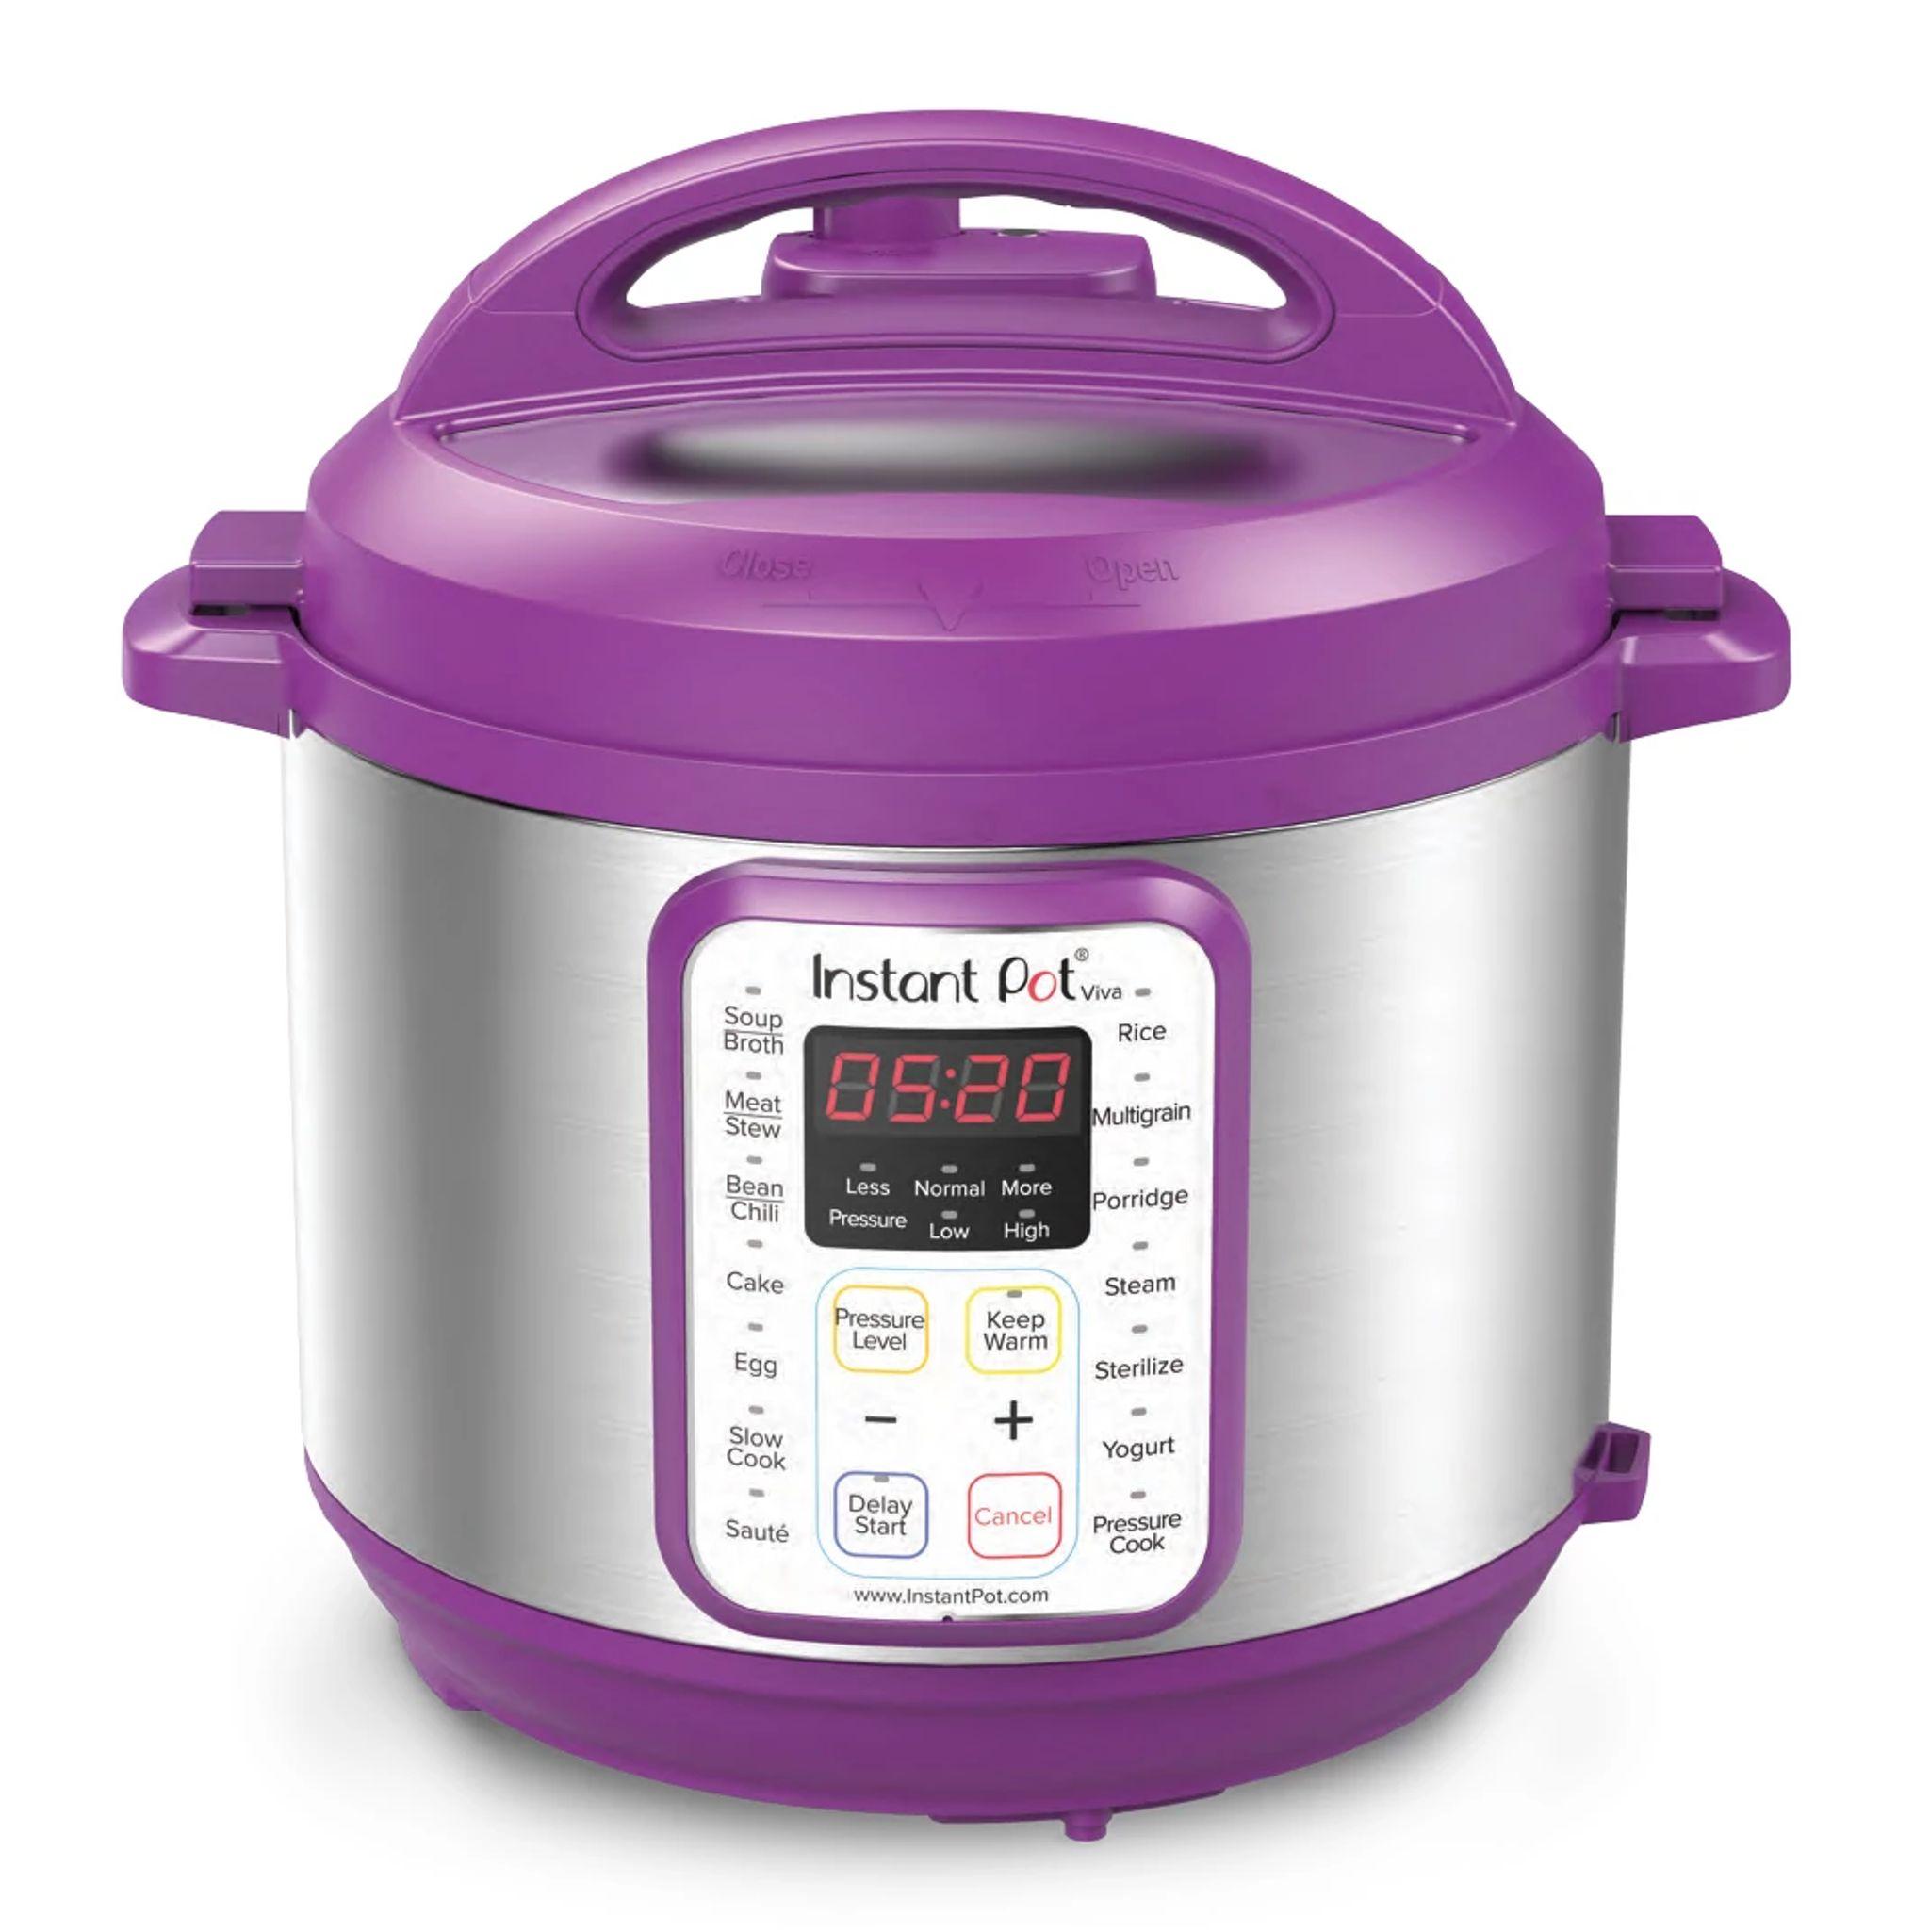 Instant Pot Viva 6-quart Multi-Use Pressure Cooker, Eggplant